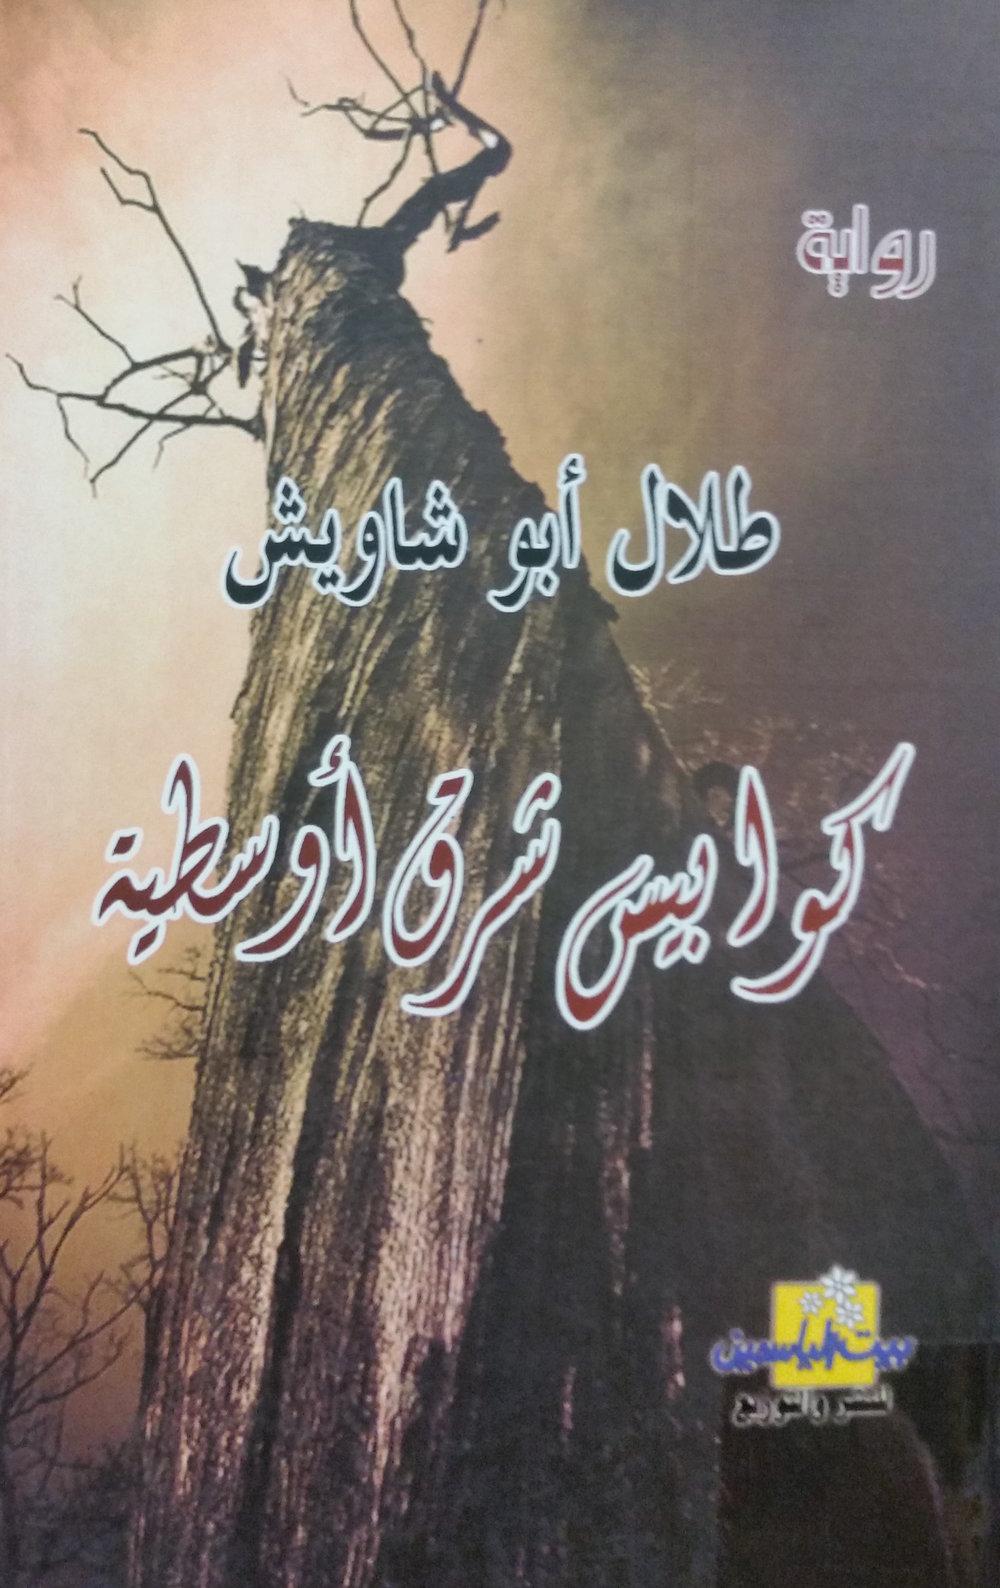 Ṭalāl Abū Shāwīsh,Kawābīs sharq awsaṭiyyah (ʻĀbidīn, al-Qāhirah: Bayt al-Yāsamīn li-l-Nashr wa-l-Tawzīʻ, 2012).